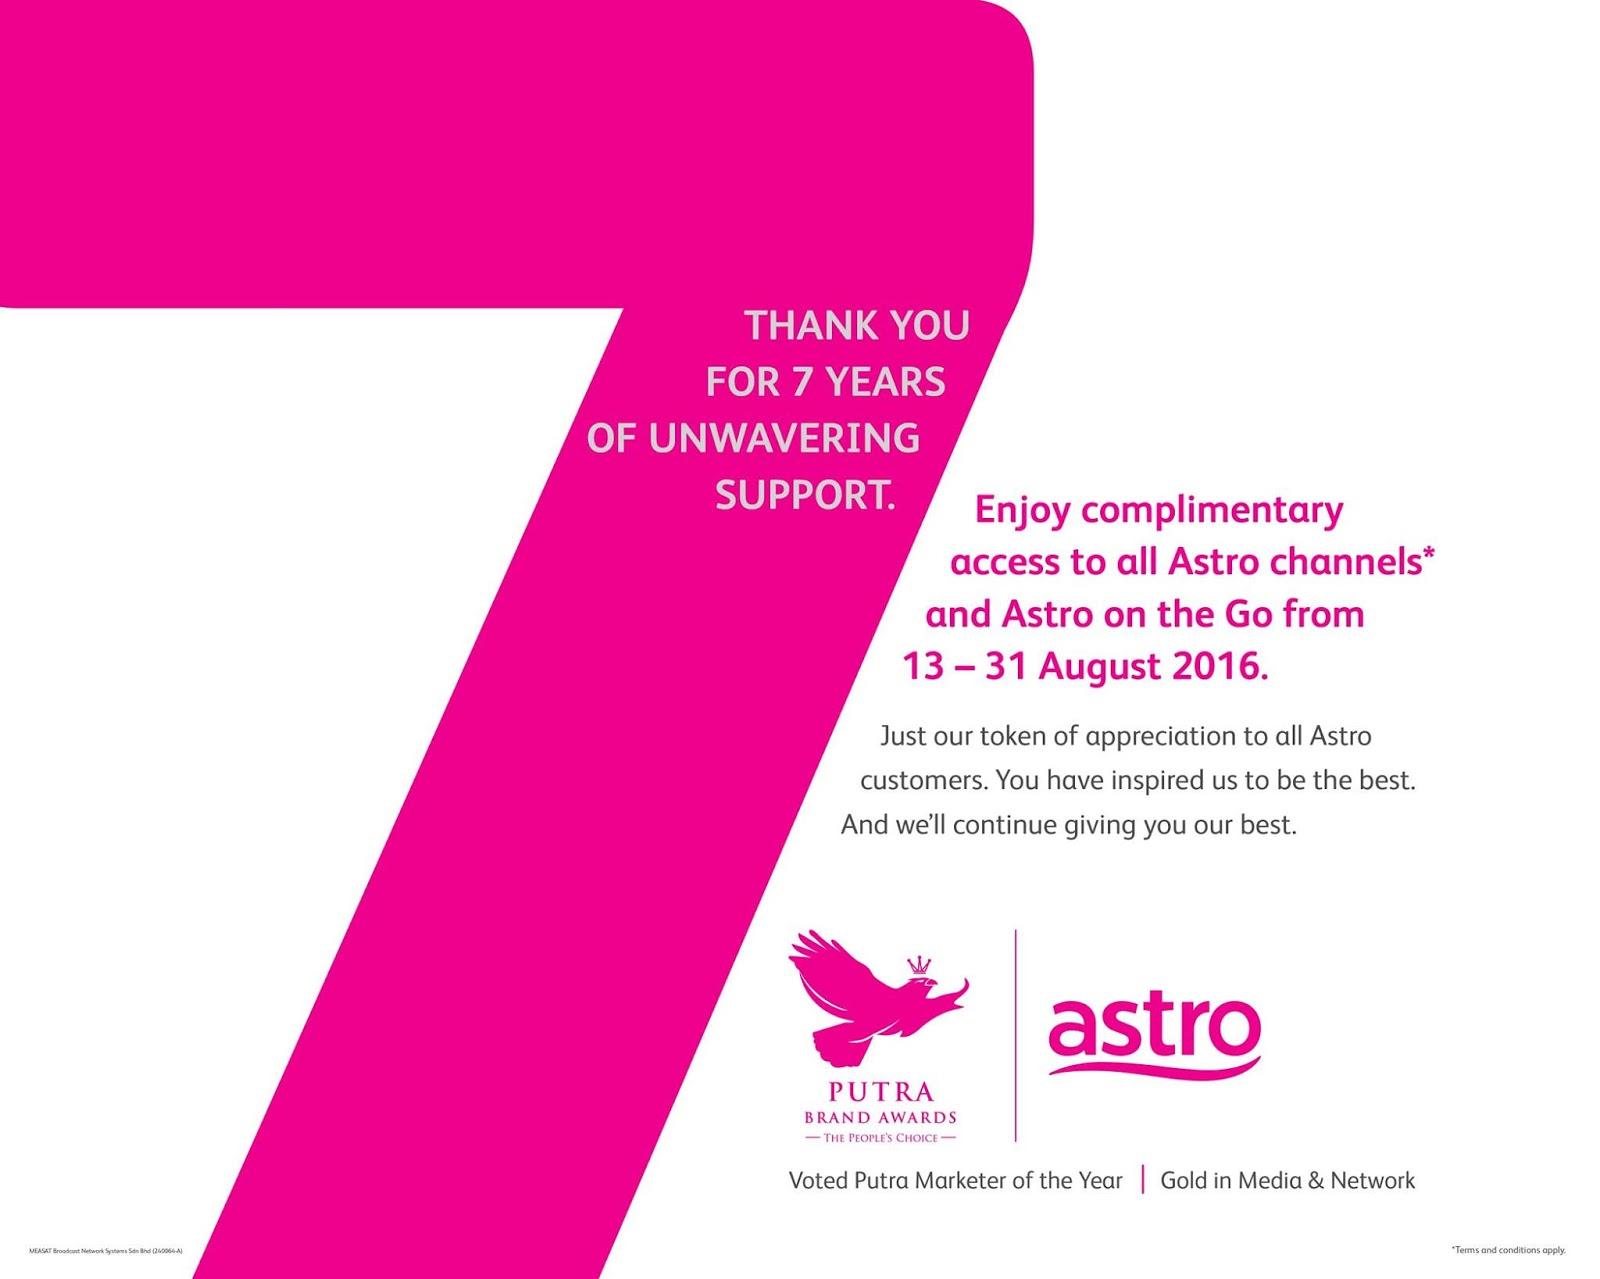 baru betul semua channel astro free sampai 31 Ogos 2016